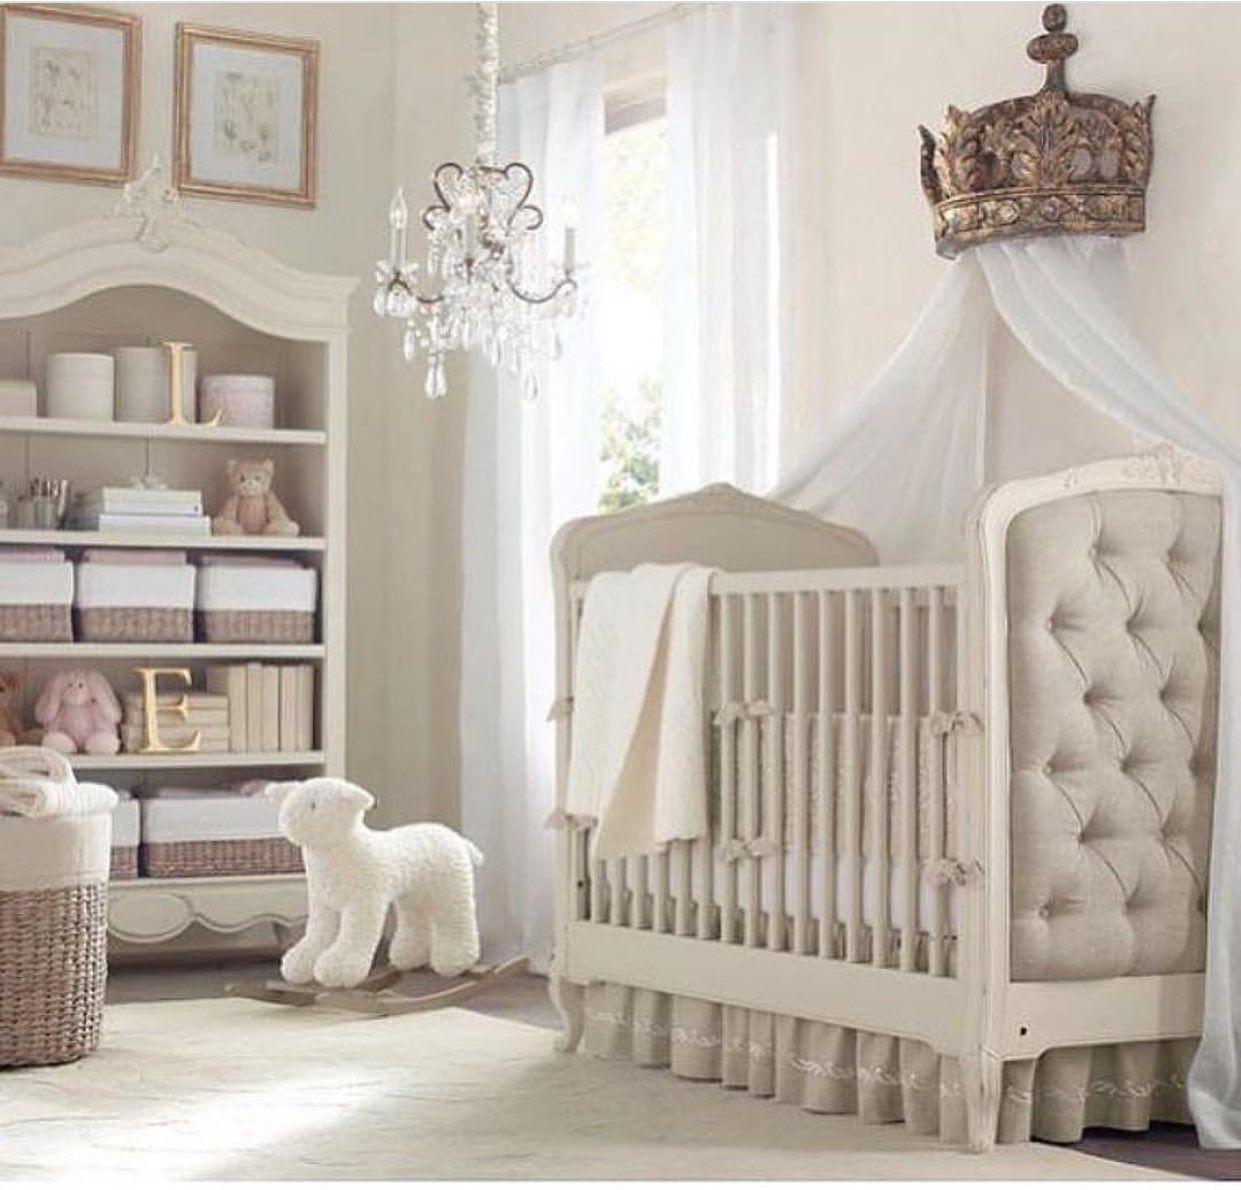 Nursery Nurseryinspo Dreamnursery Cameretta Per Bimbi Pinterest ~ Quarto De Bebe Unisex Simples E Lustres Para Quarto Casal